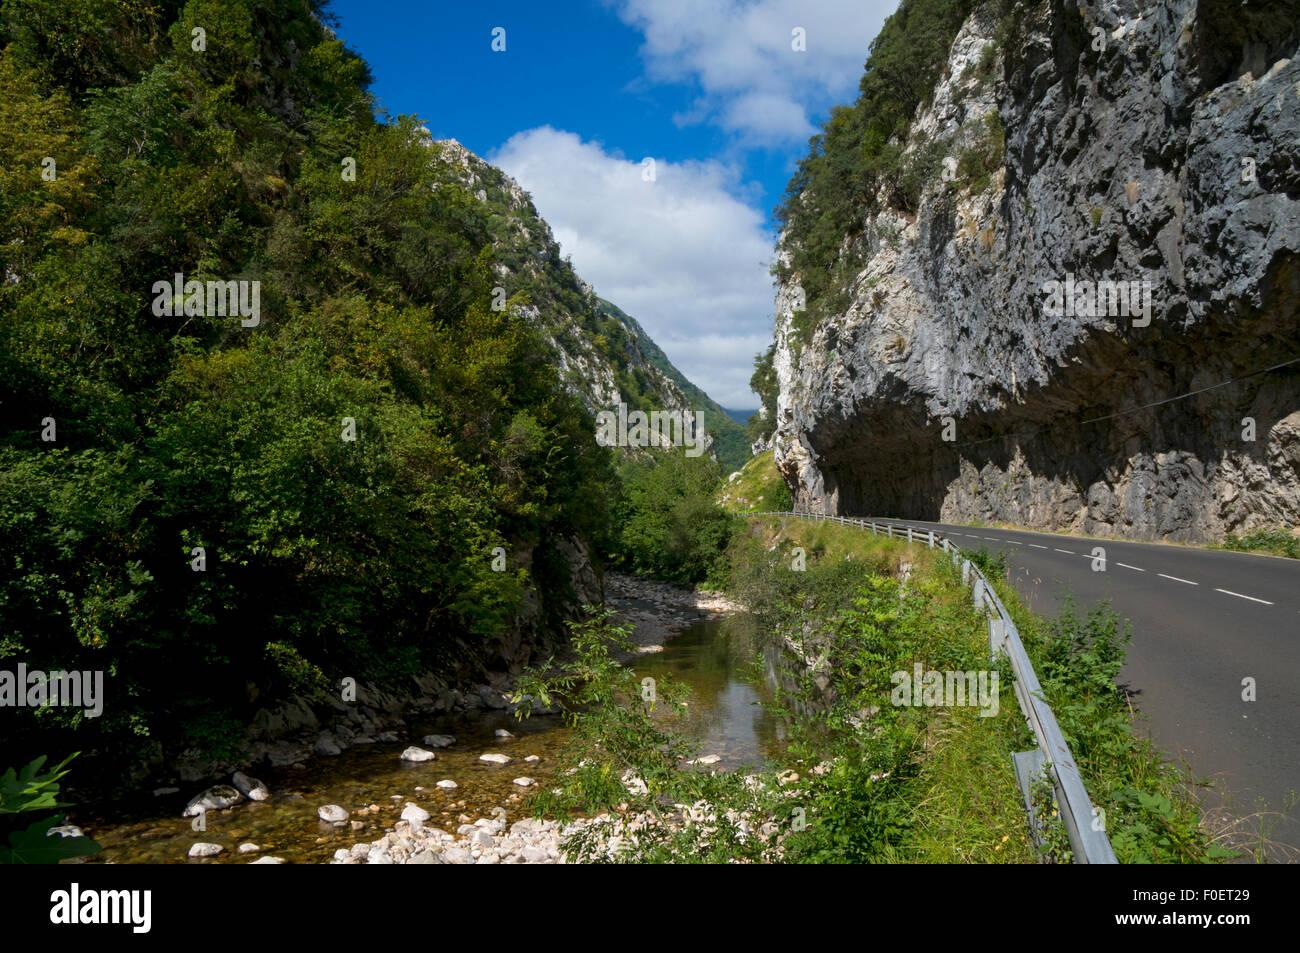 gorge road to Picos de Europa national park,Asturias,Northern Spain - Stock Image